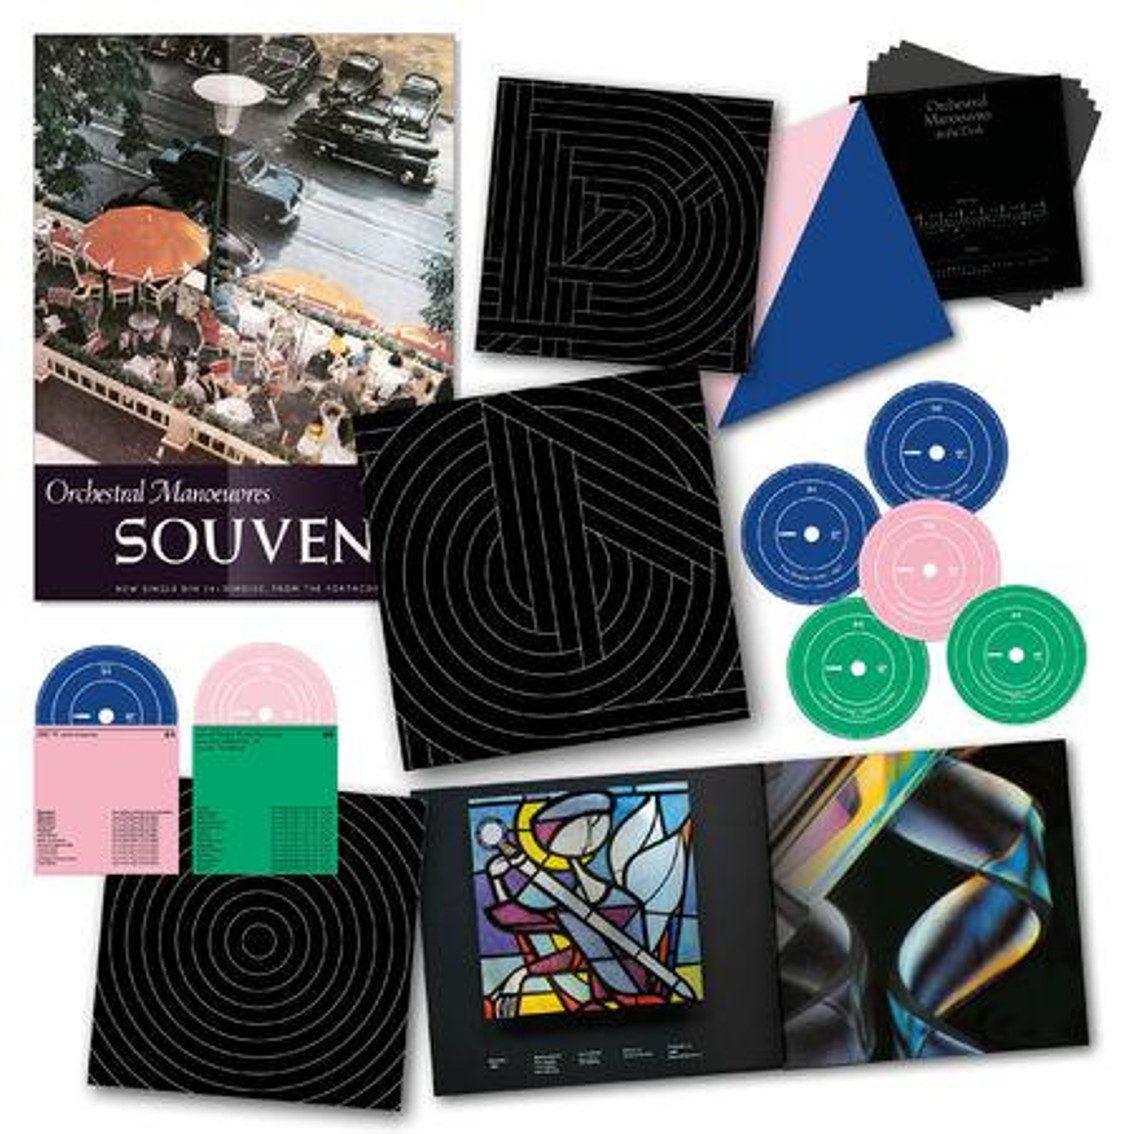 OMD launch 40th anniversary boxset 'Souvenir - The Singles 1979-2019' + MEGAtour